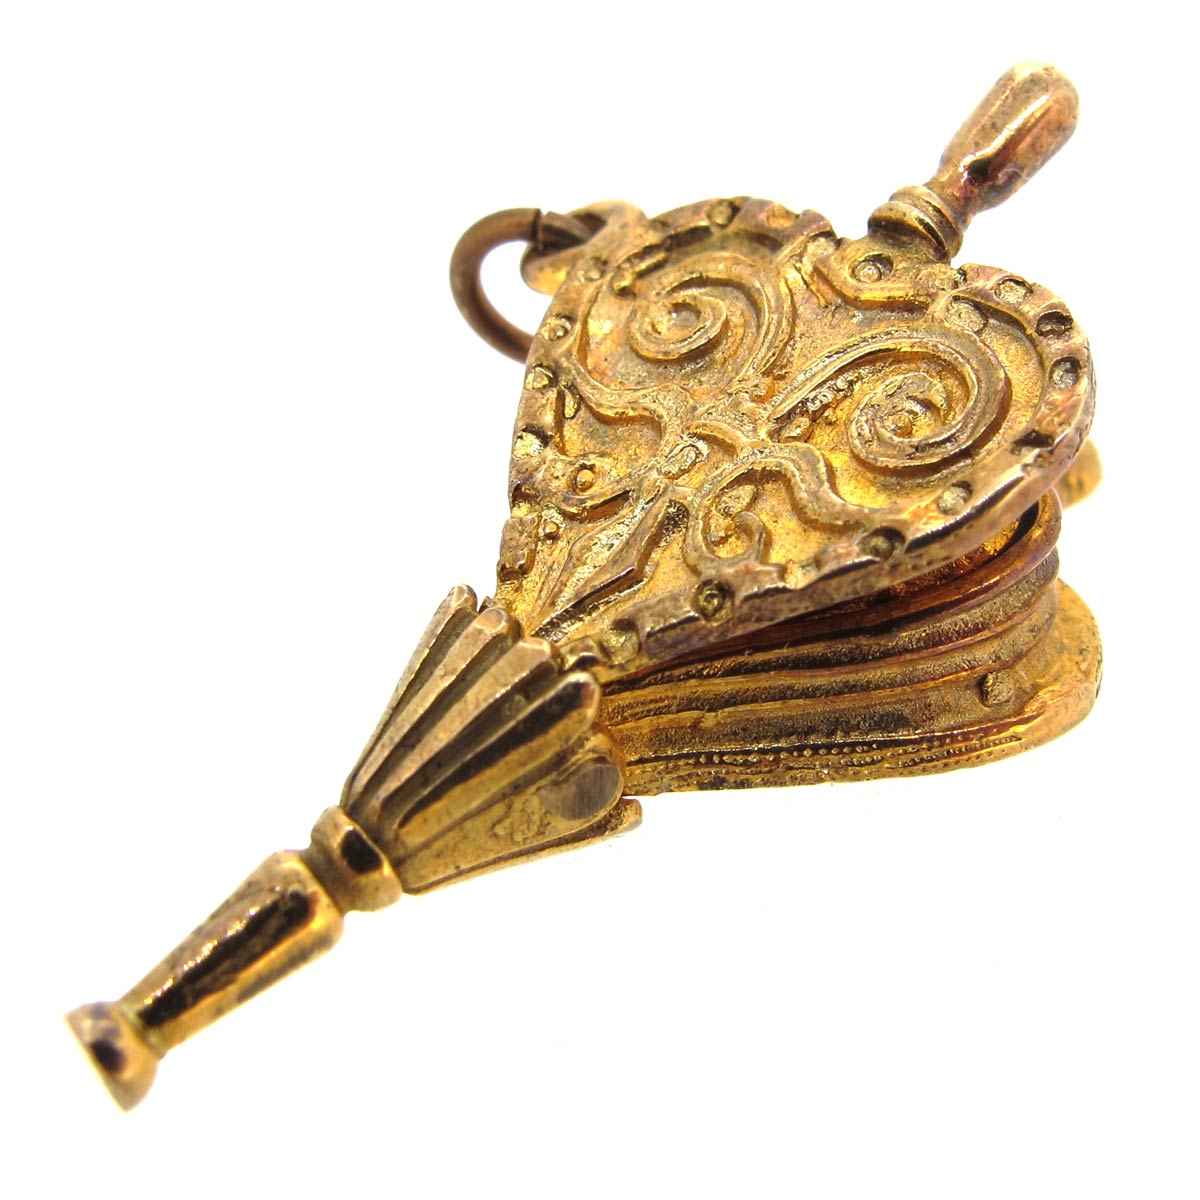 Gold Bellows Charm